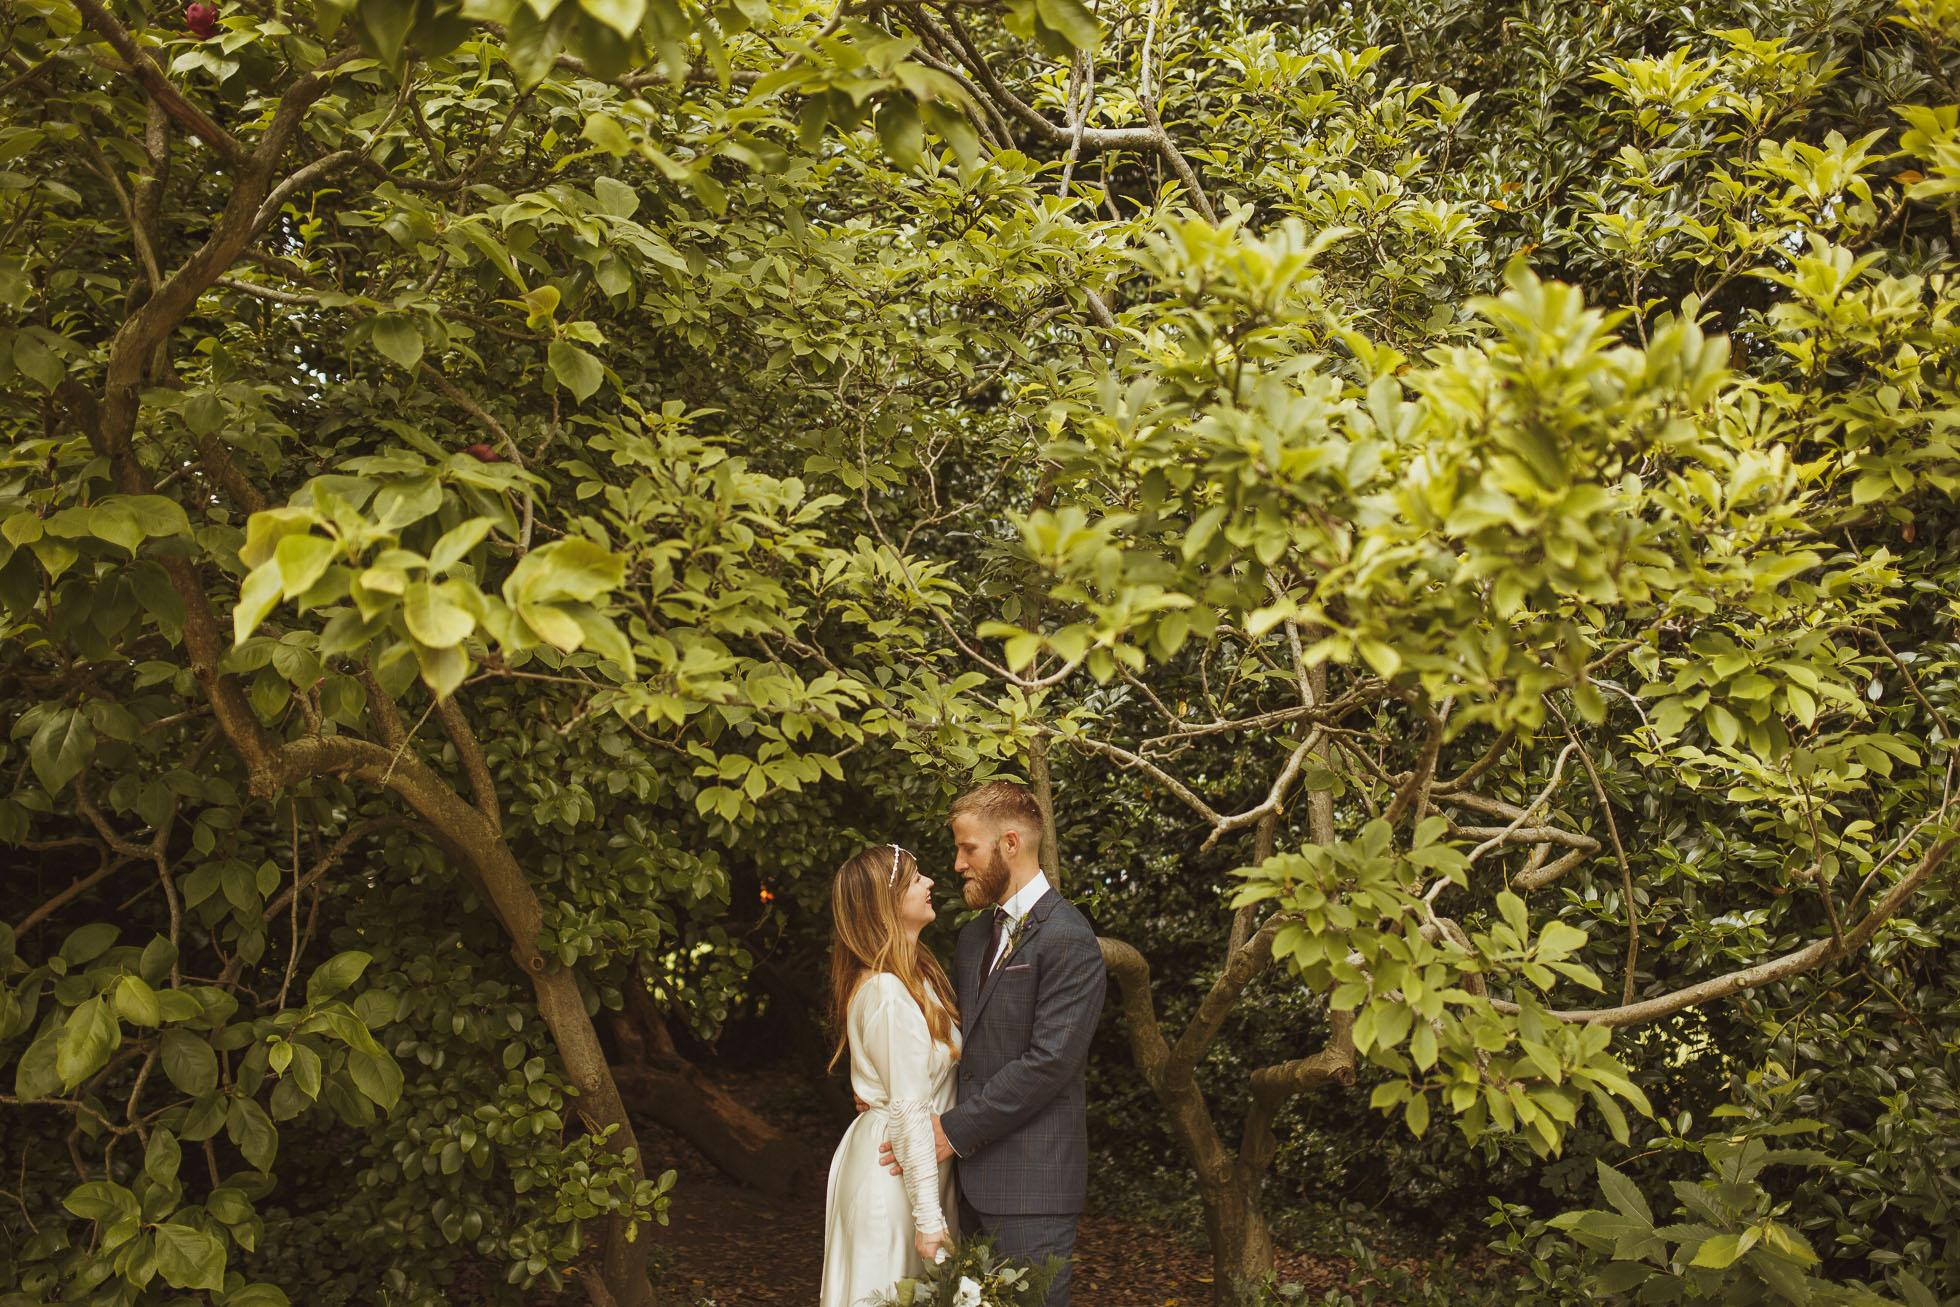 sheffield-botanical-gardens-wedding-photographer-40.jpg